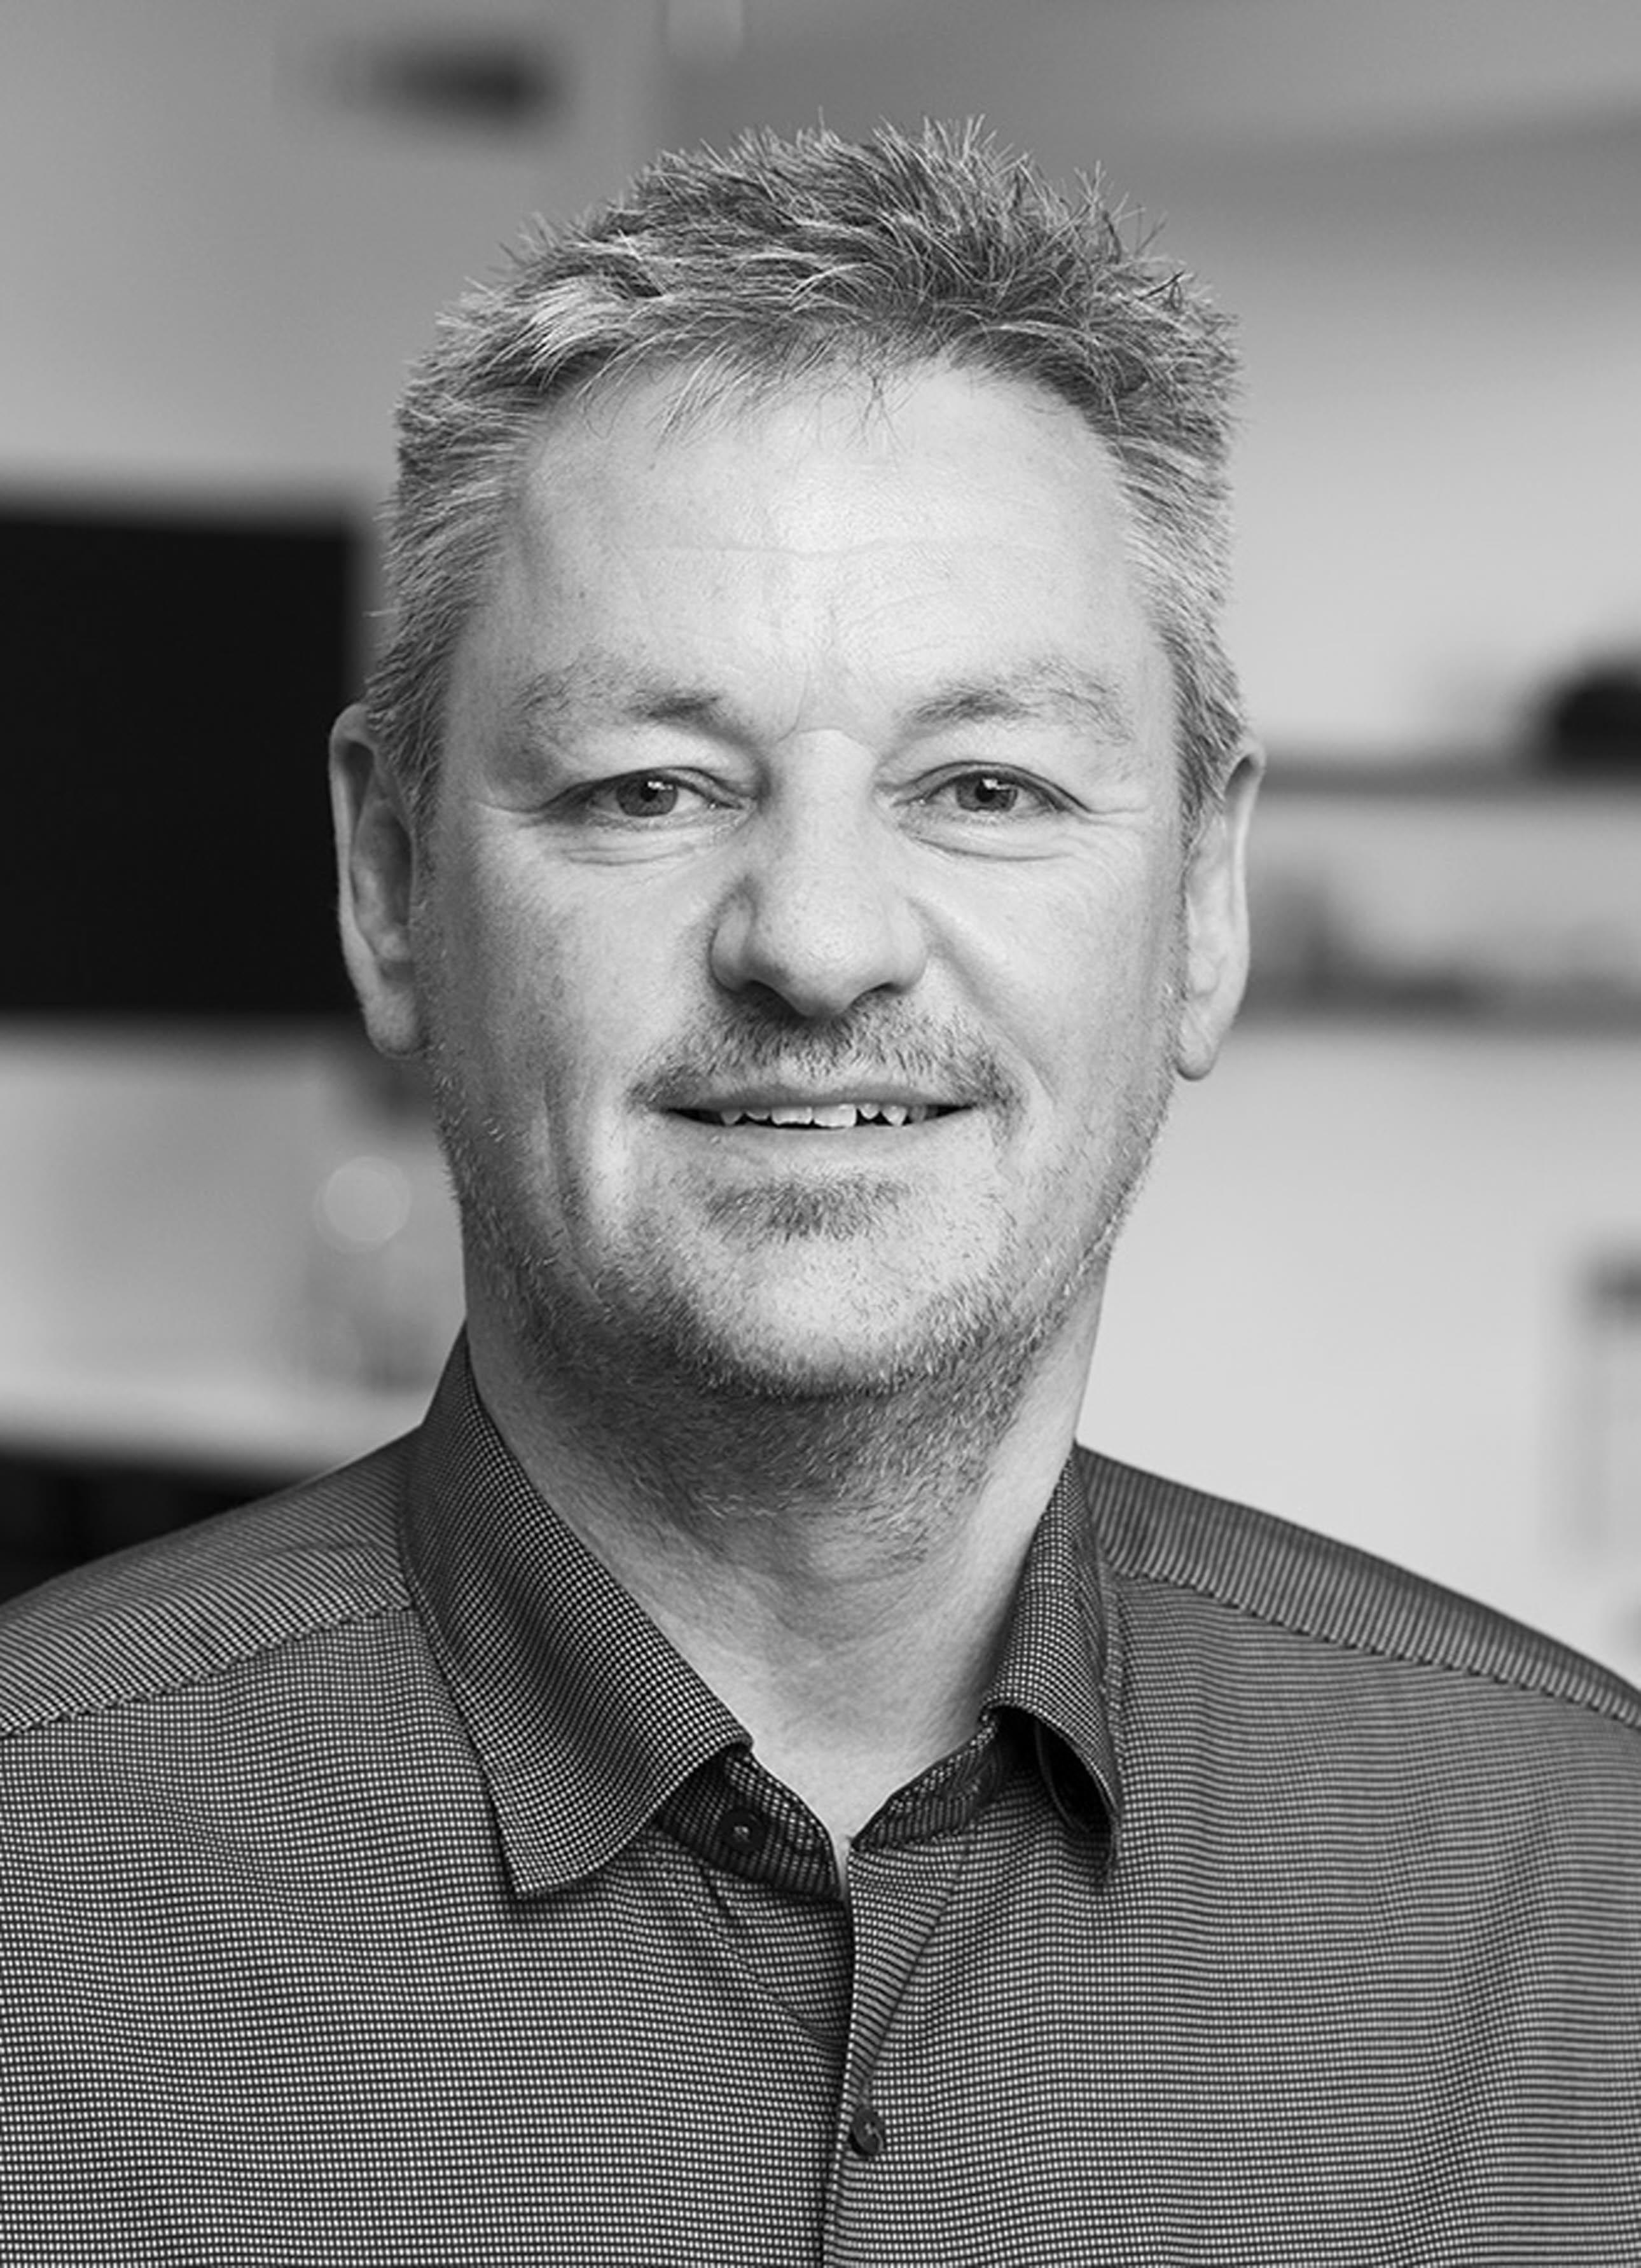 Svend Stabell Jørgensen